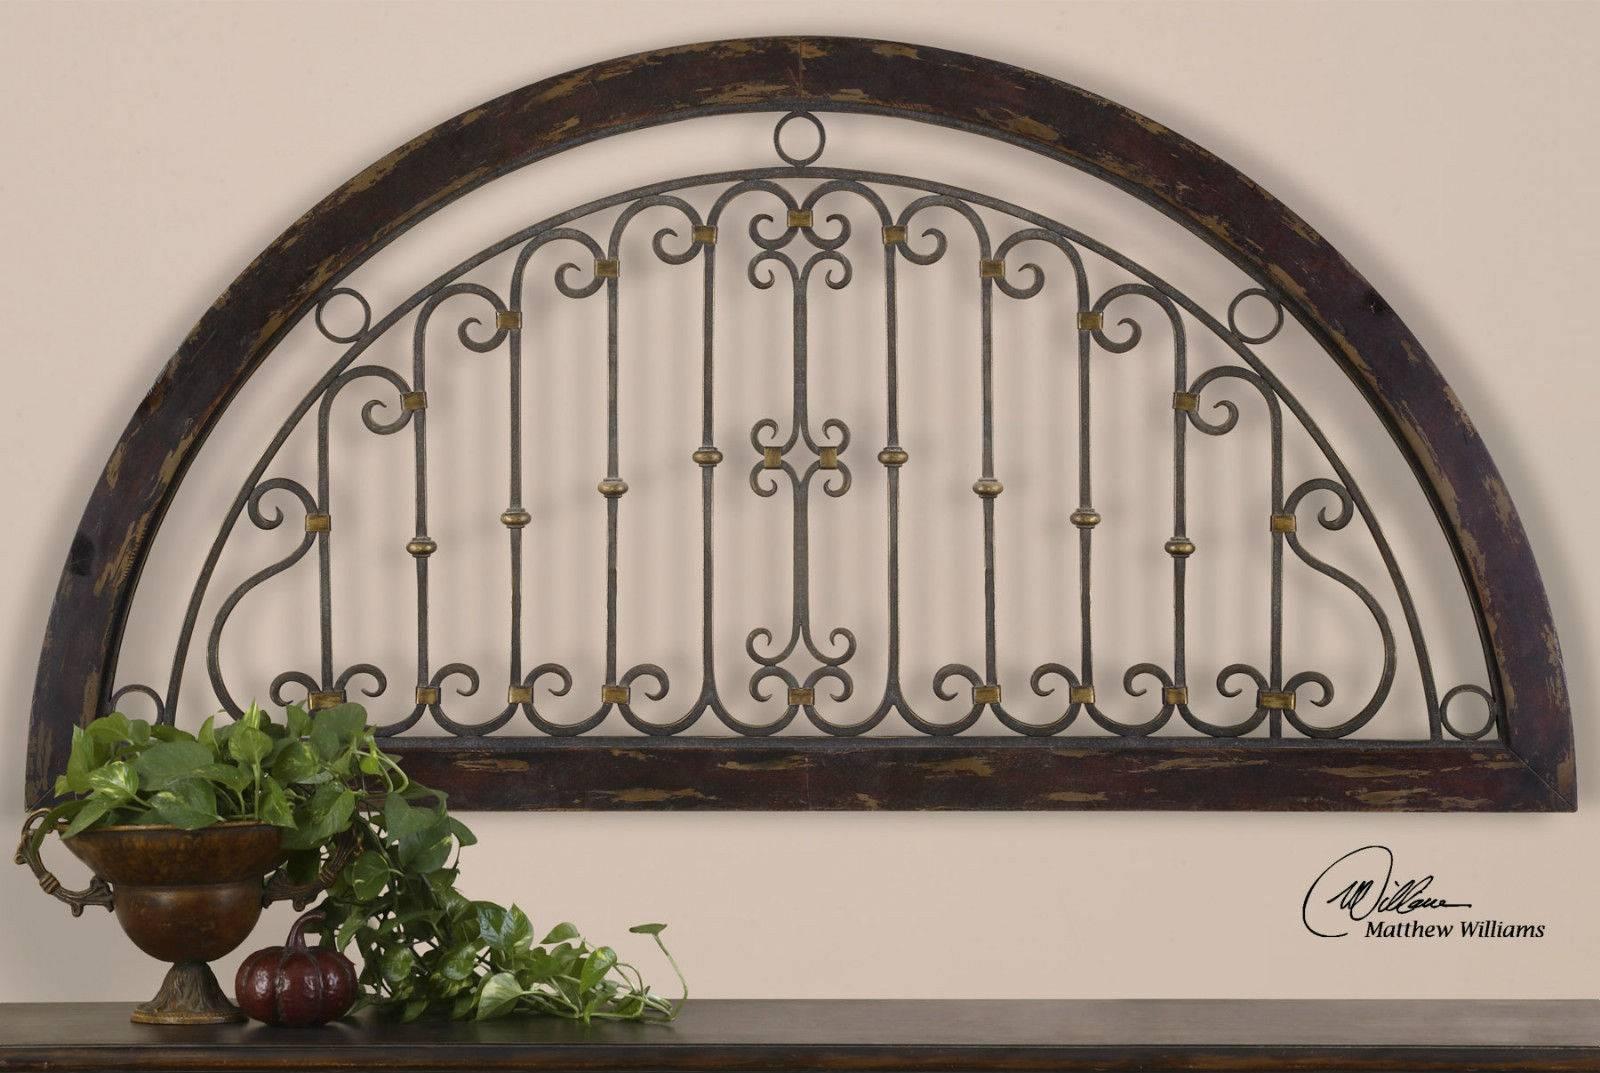 Wall Art Wood Metal | Wallartideas Regarding Most Up To Date Wood Metal Wall Art (View 15 of 20)